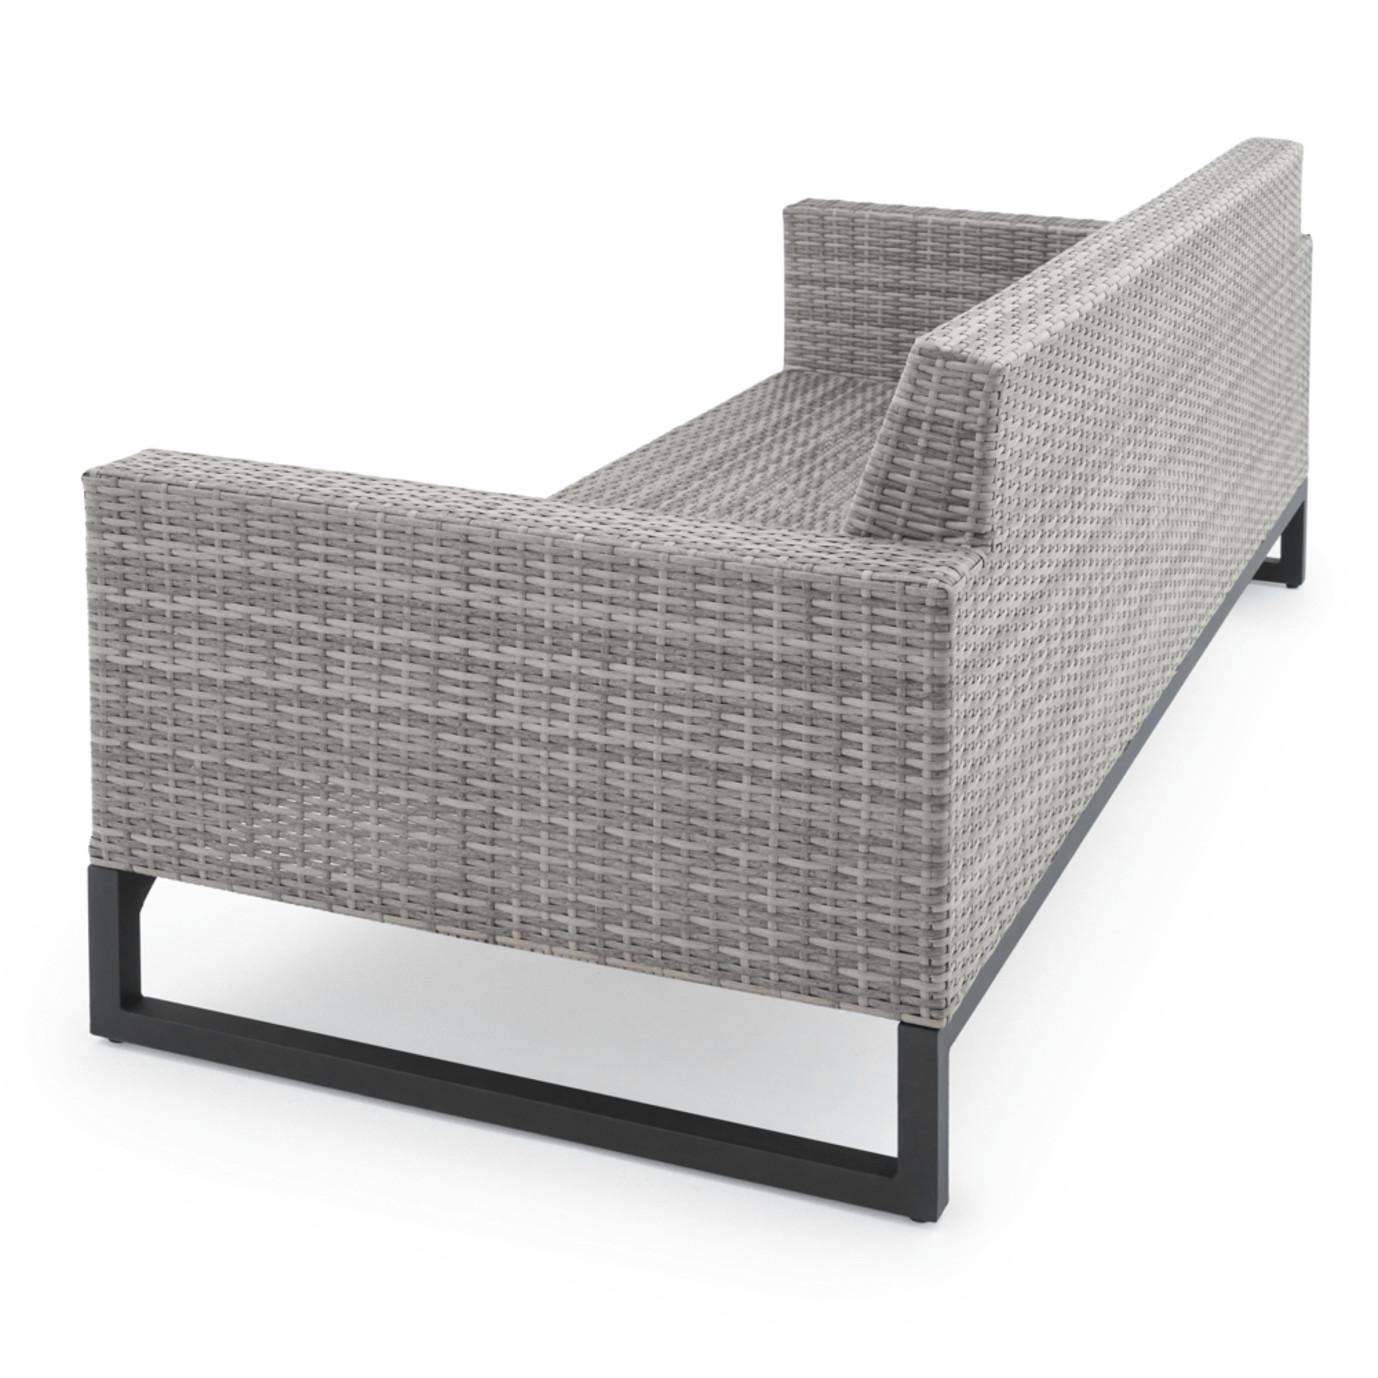 Milo™ Gray 78in Sofa - Maxim Beige